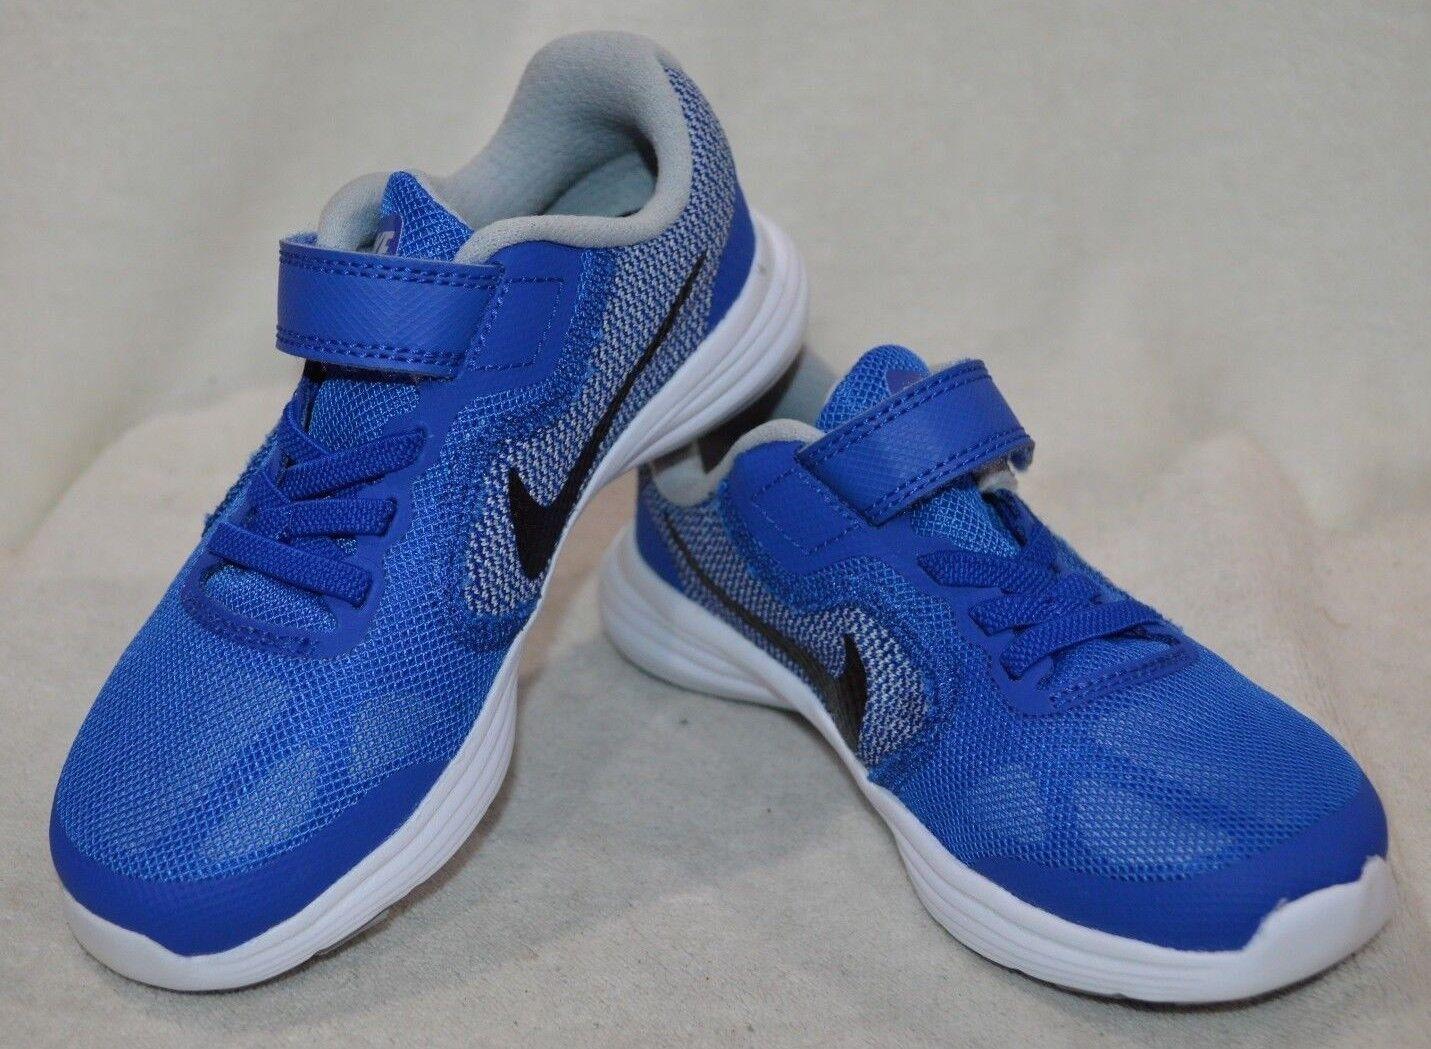 9c2428d33a7 Shoes Child Nike Revolution 3 PSV 819414-402 32 - US 1y - Cm 20 | eBay